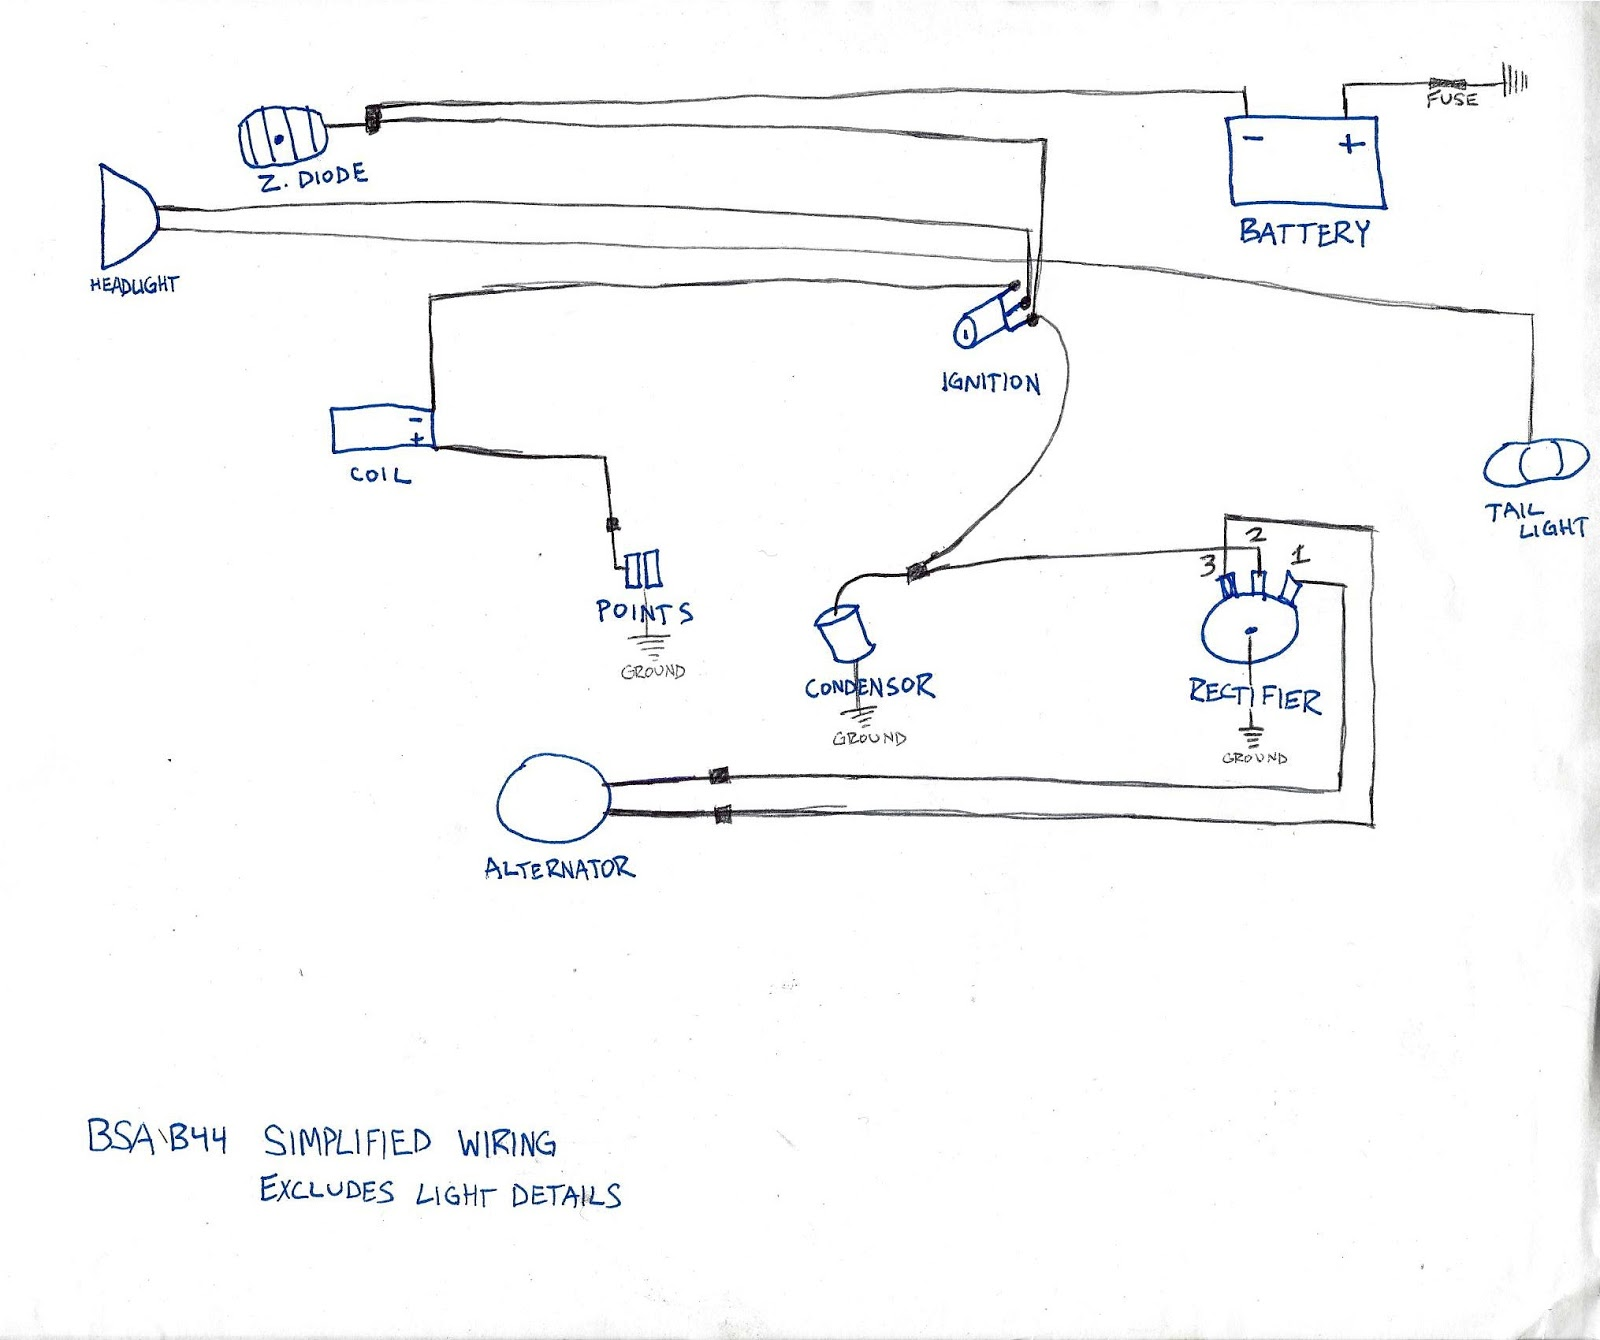 bsa wiring diagrams wiring diagram source two wire alternator wiring diagram 1968 bsa wiring diagram [ 1600 x 1340 Pixel ]